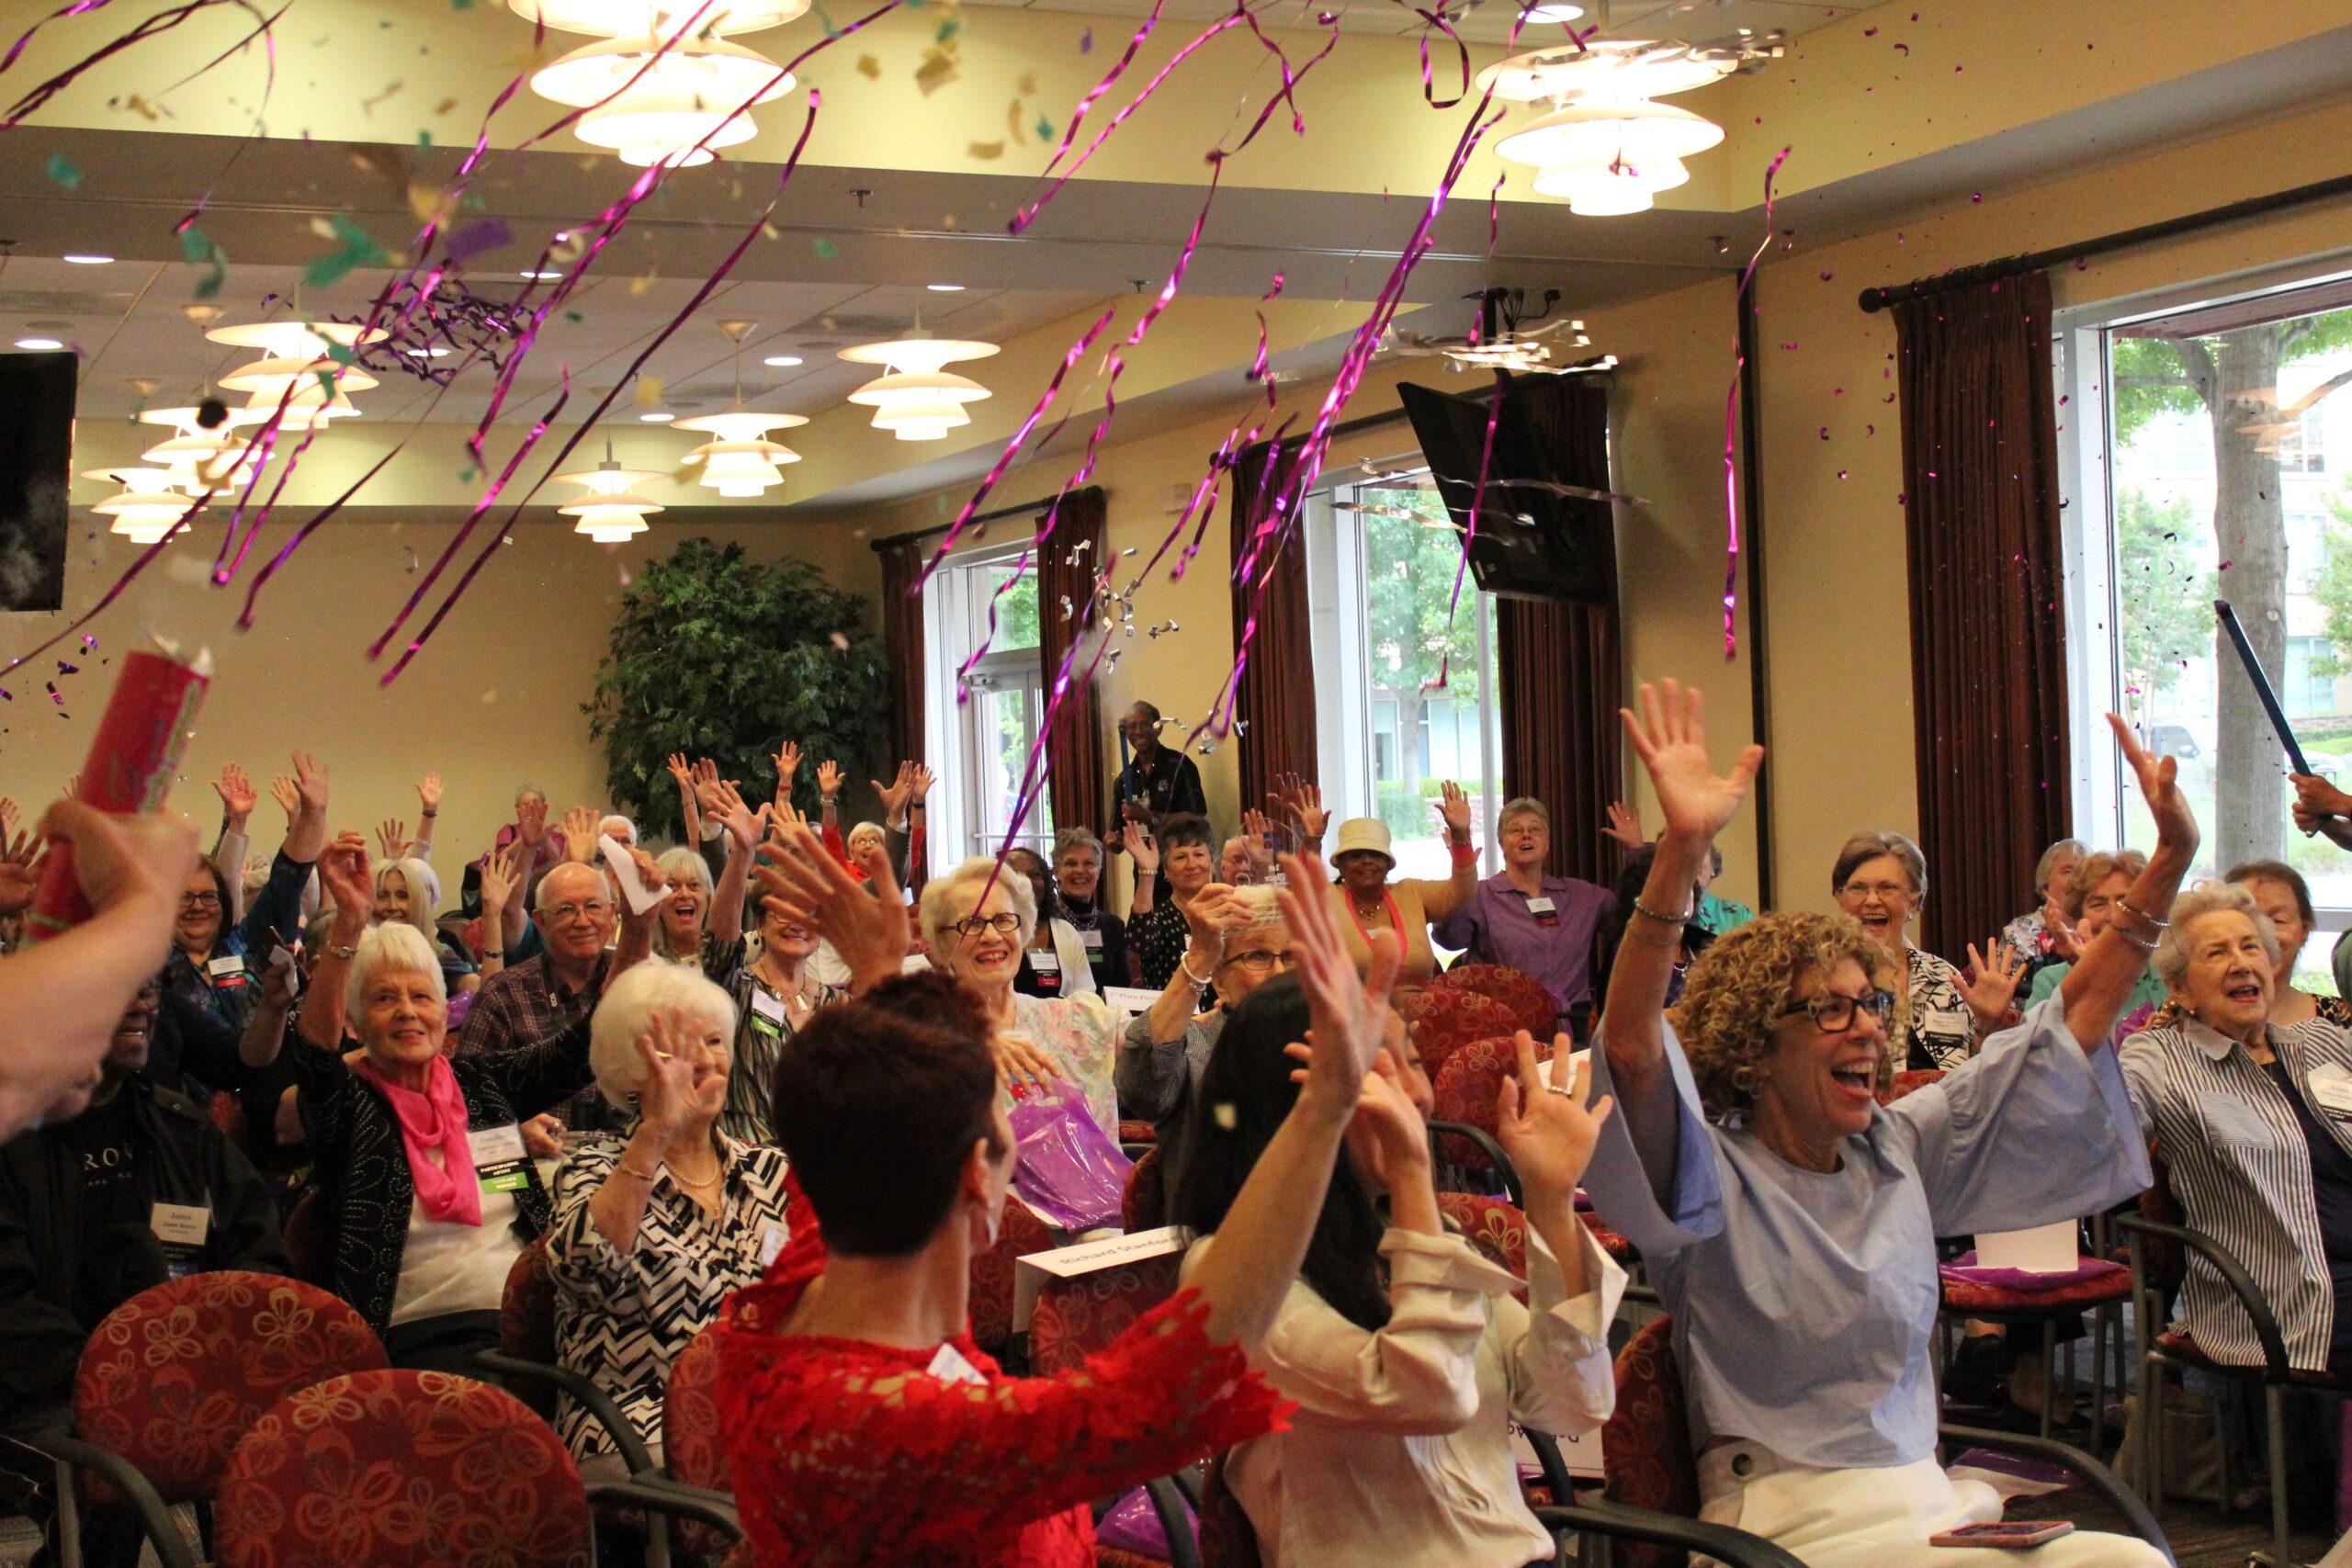 seniors celebrating with confetti at CC Young senior living